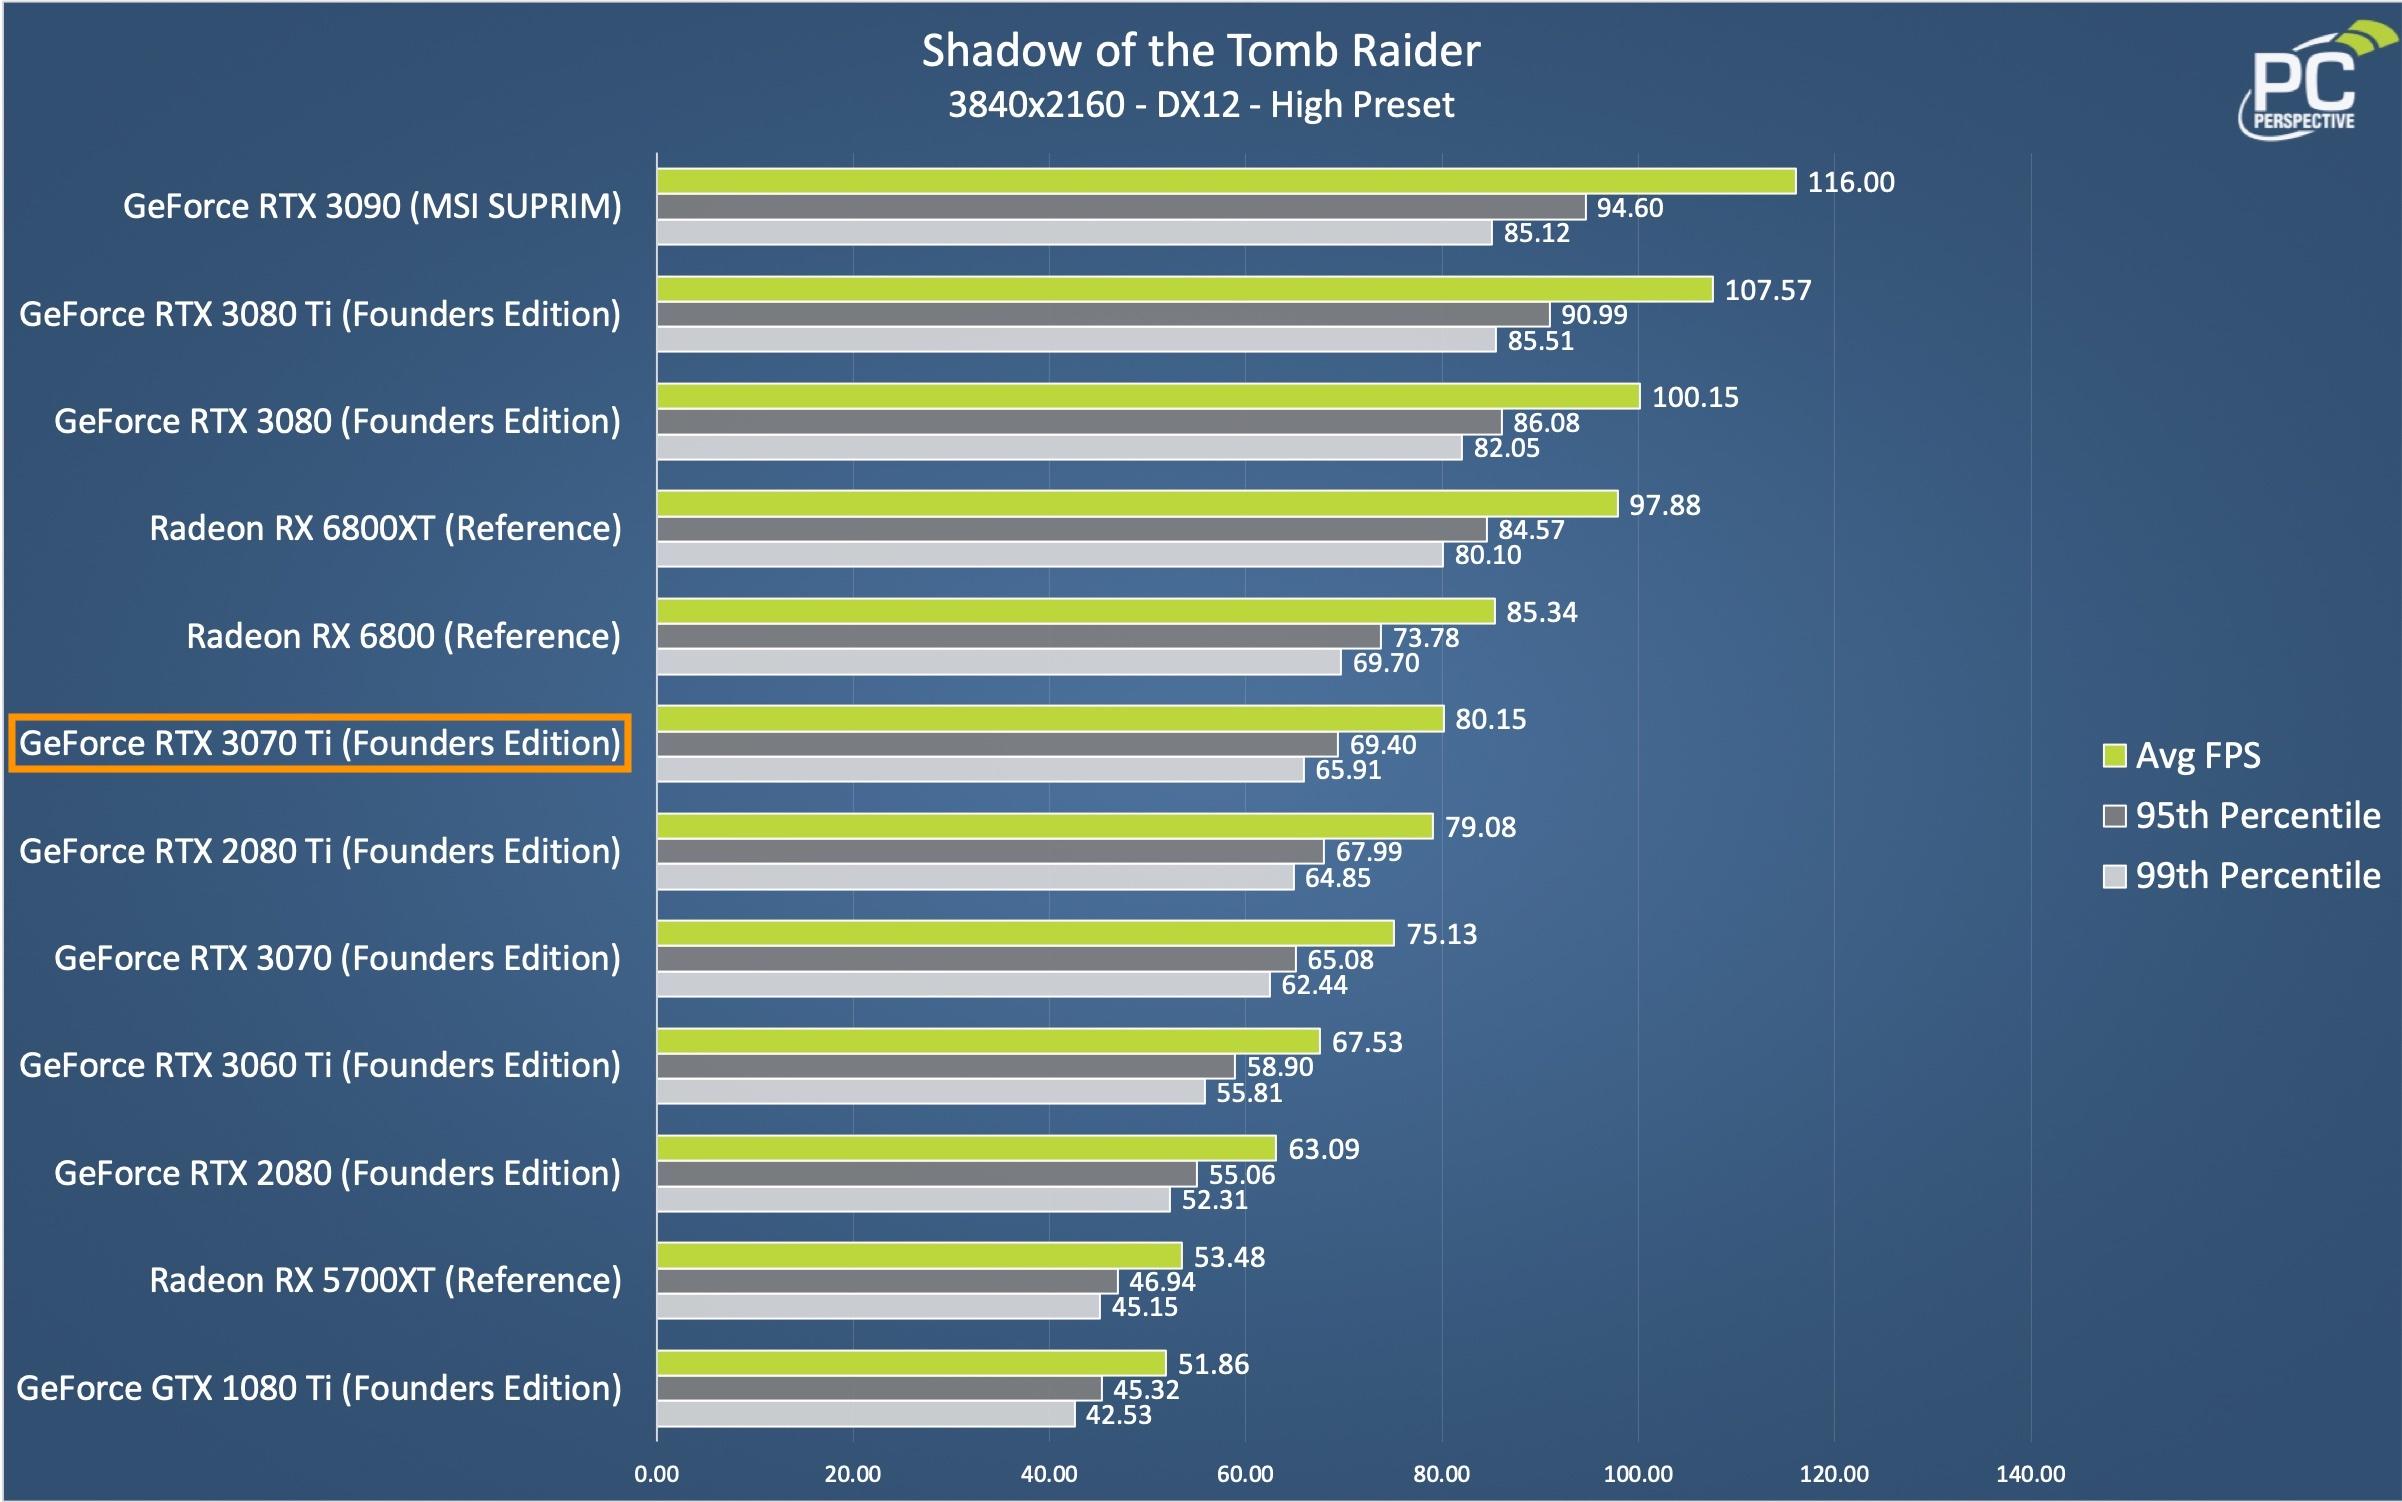 NVIDIA GeForce RTX 3070 Ti FE Shadow of the Tomb Raider Chart